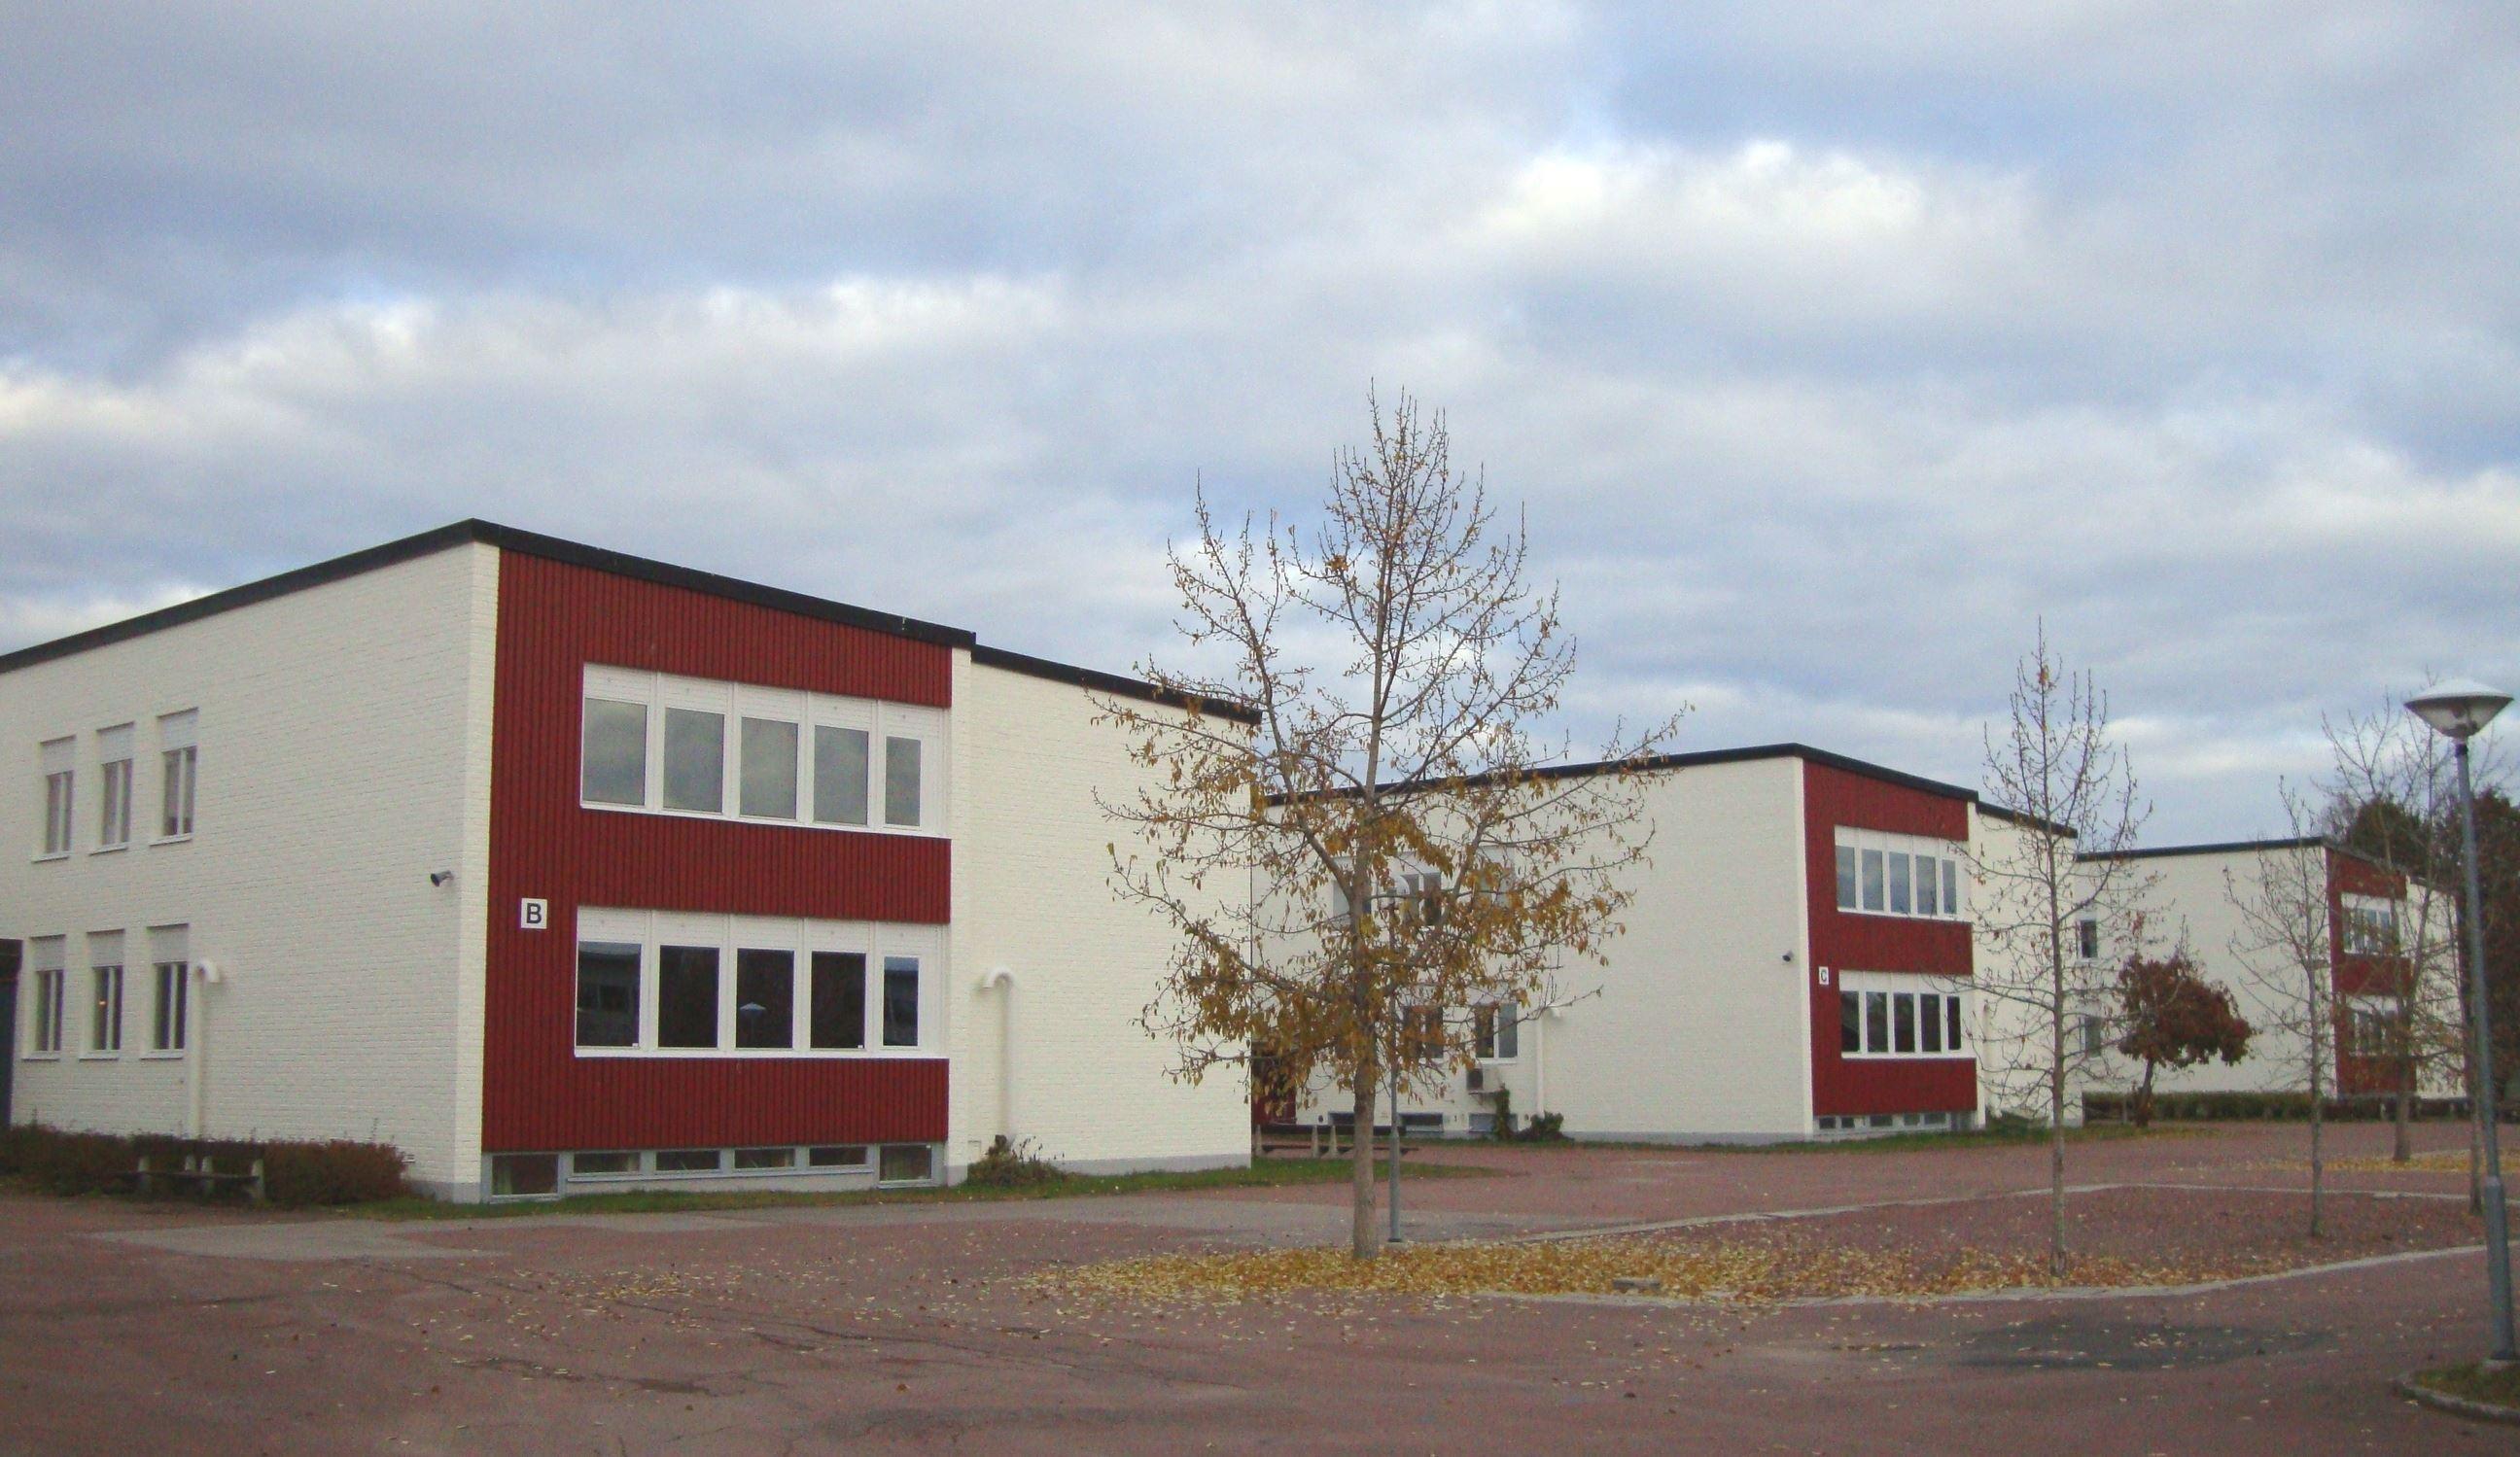 Mora Gymnasium, billigt Vasaloppsboende i sovsal